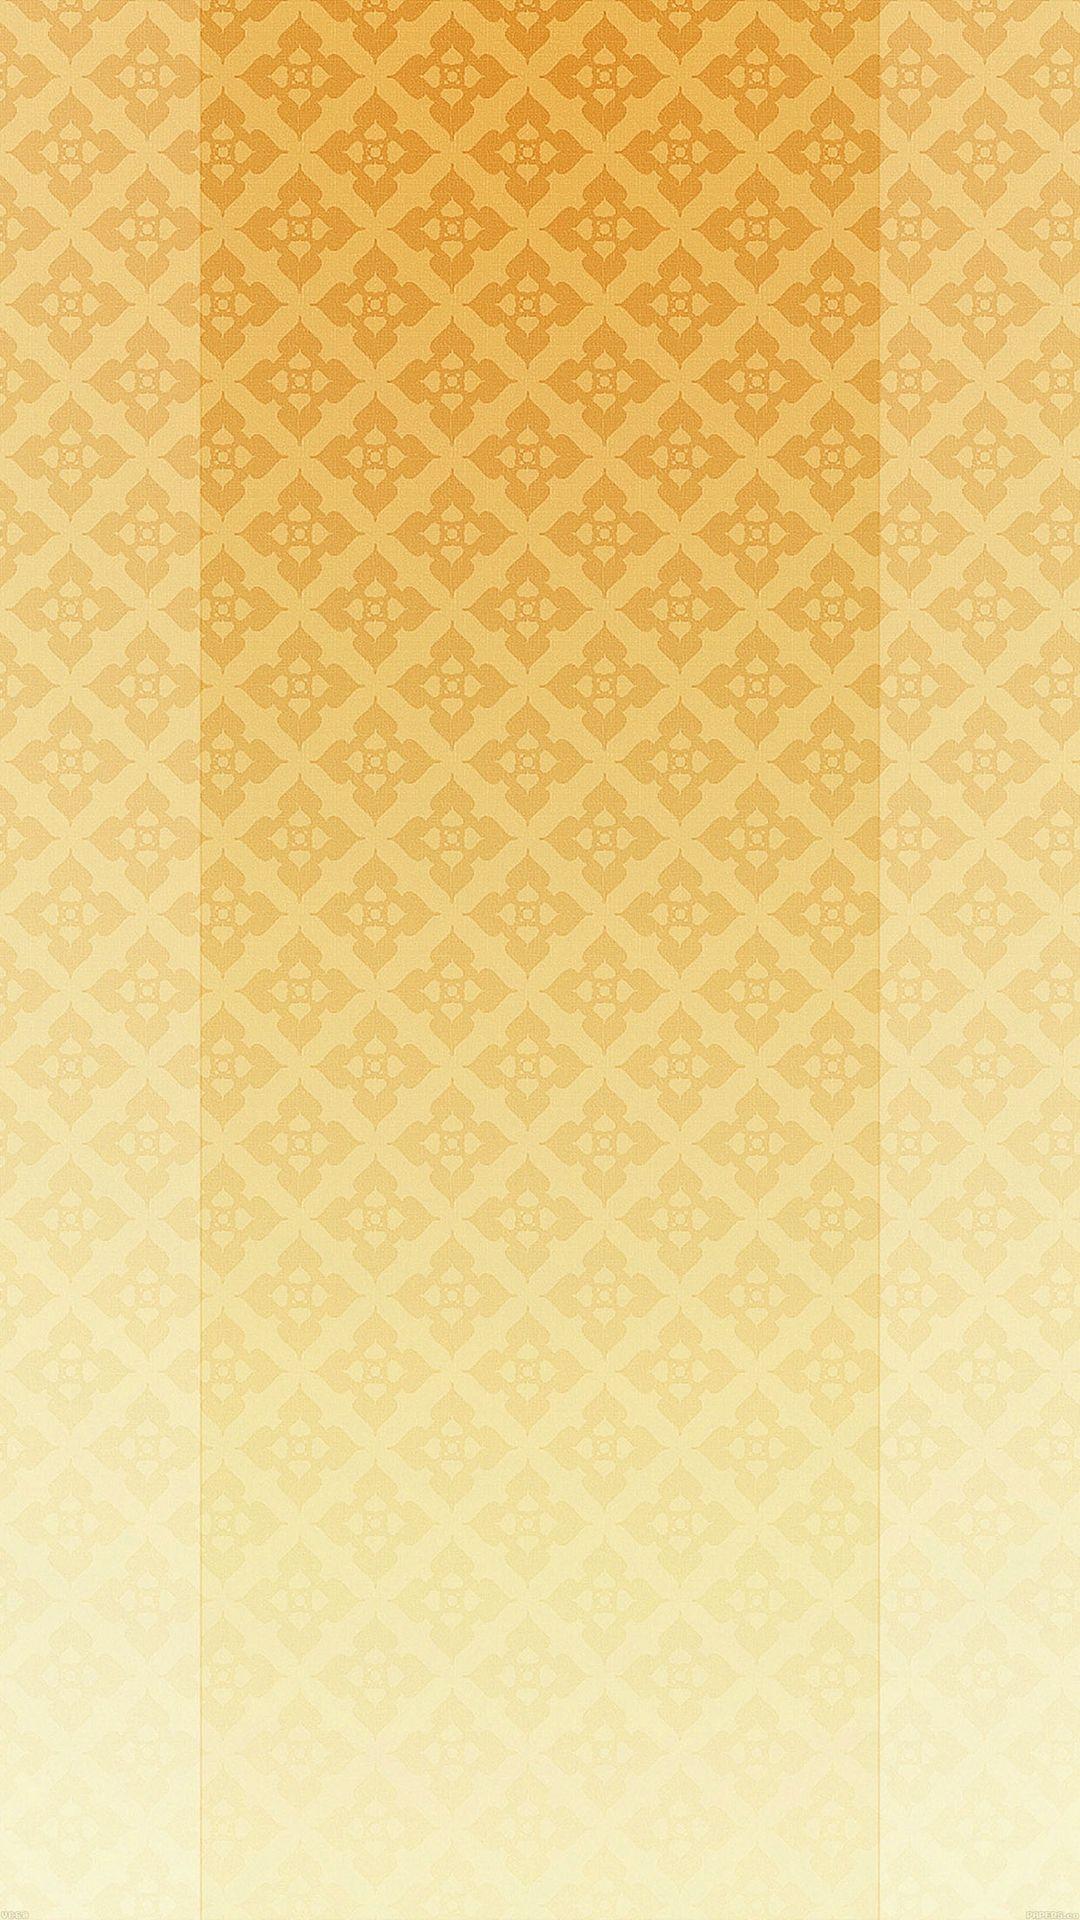 Texture Pattern Dark Gold Iphone 6 Wallpaper Download Iphone Wallpapers Ipad Wallpapers One Gold Wallpaper Iphone Textures Patterns Iphone 6 Plus Wallpaper